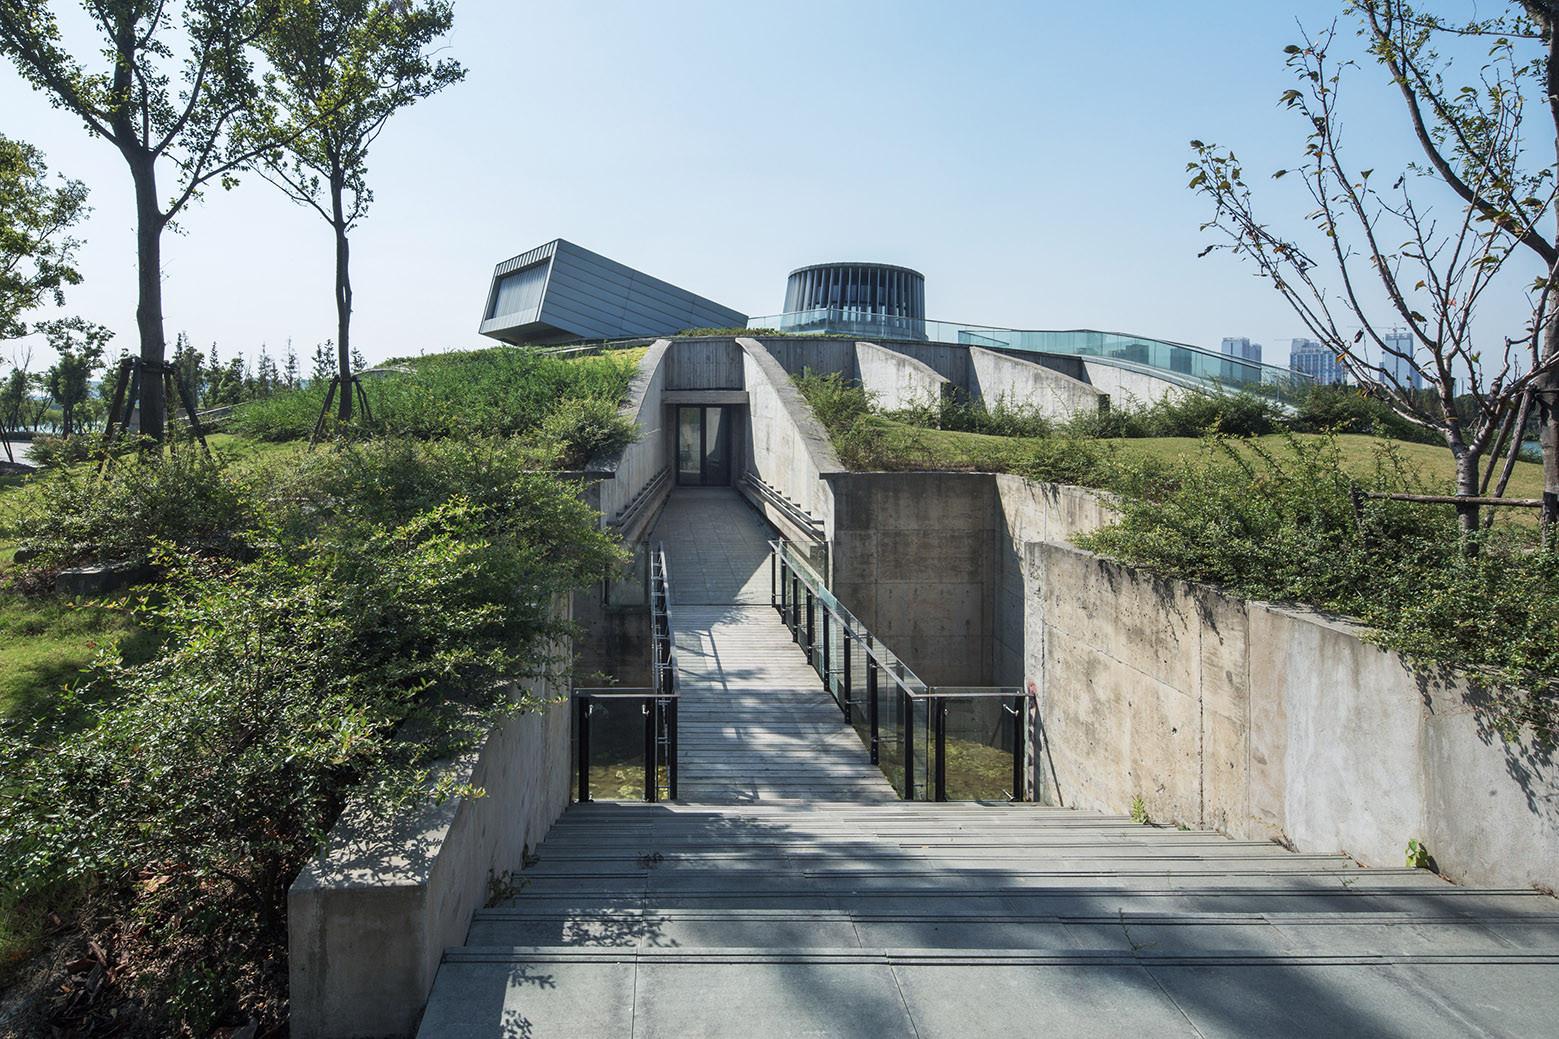 Restaurante frente al mar pro form architects for Form garden architecture